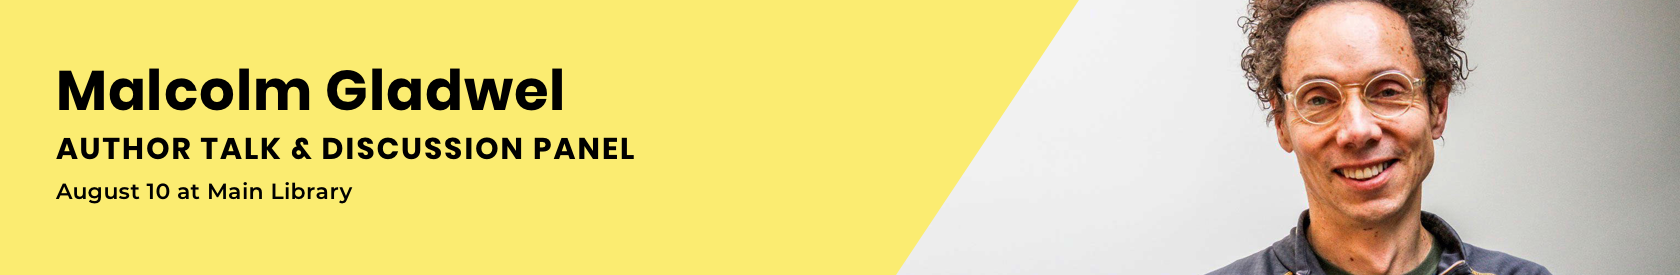 malcomgladwell_hero_colour_banner3